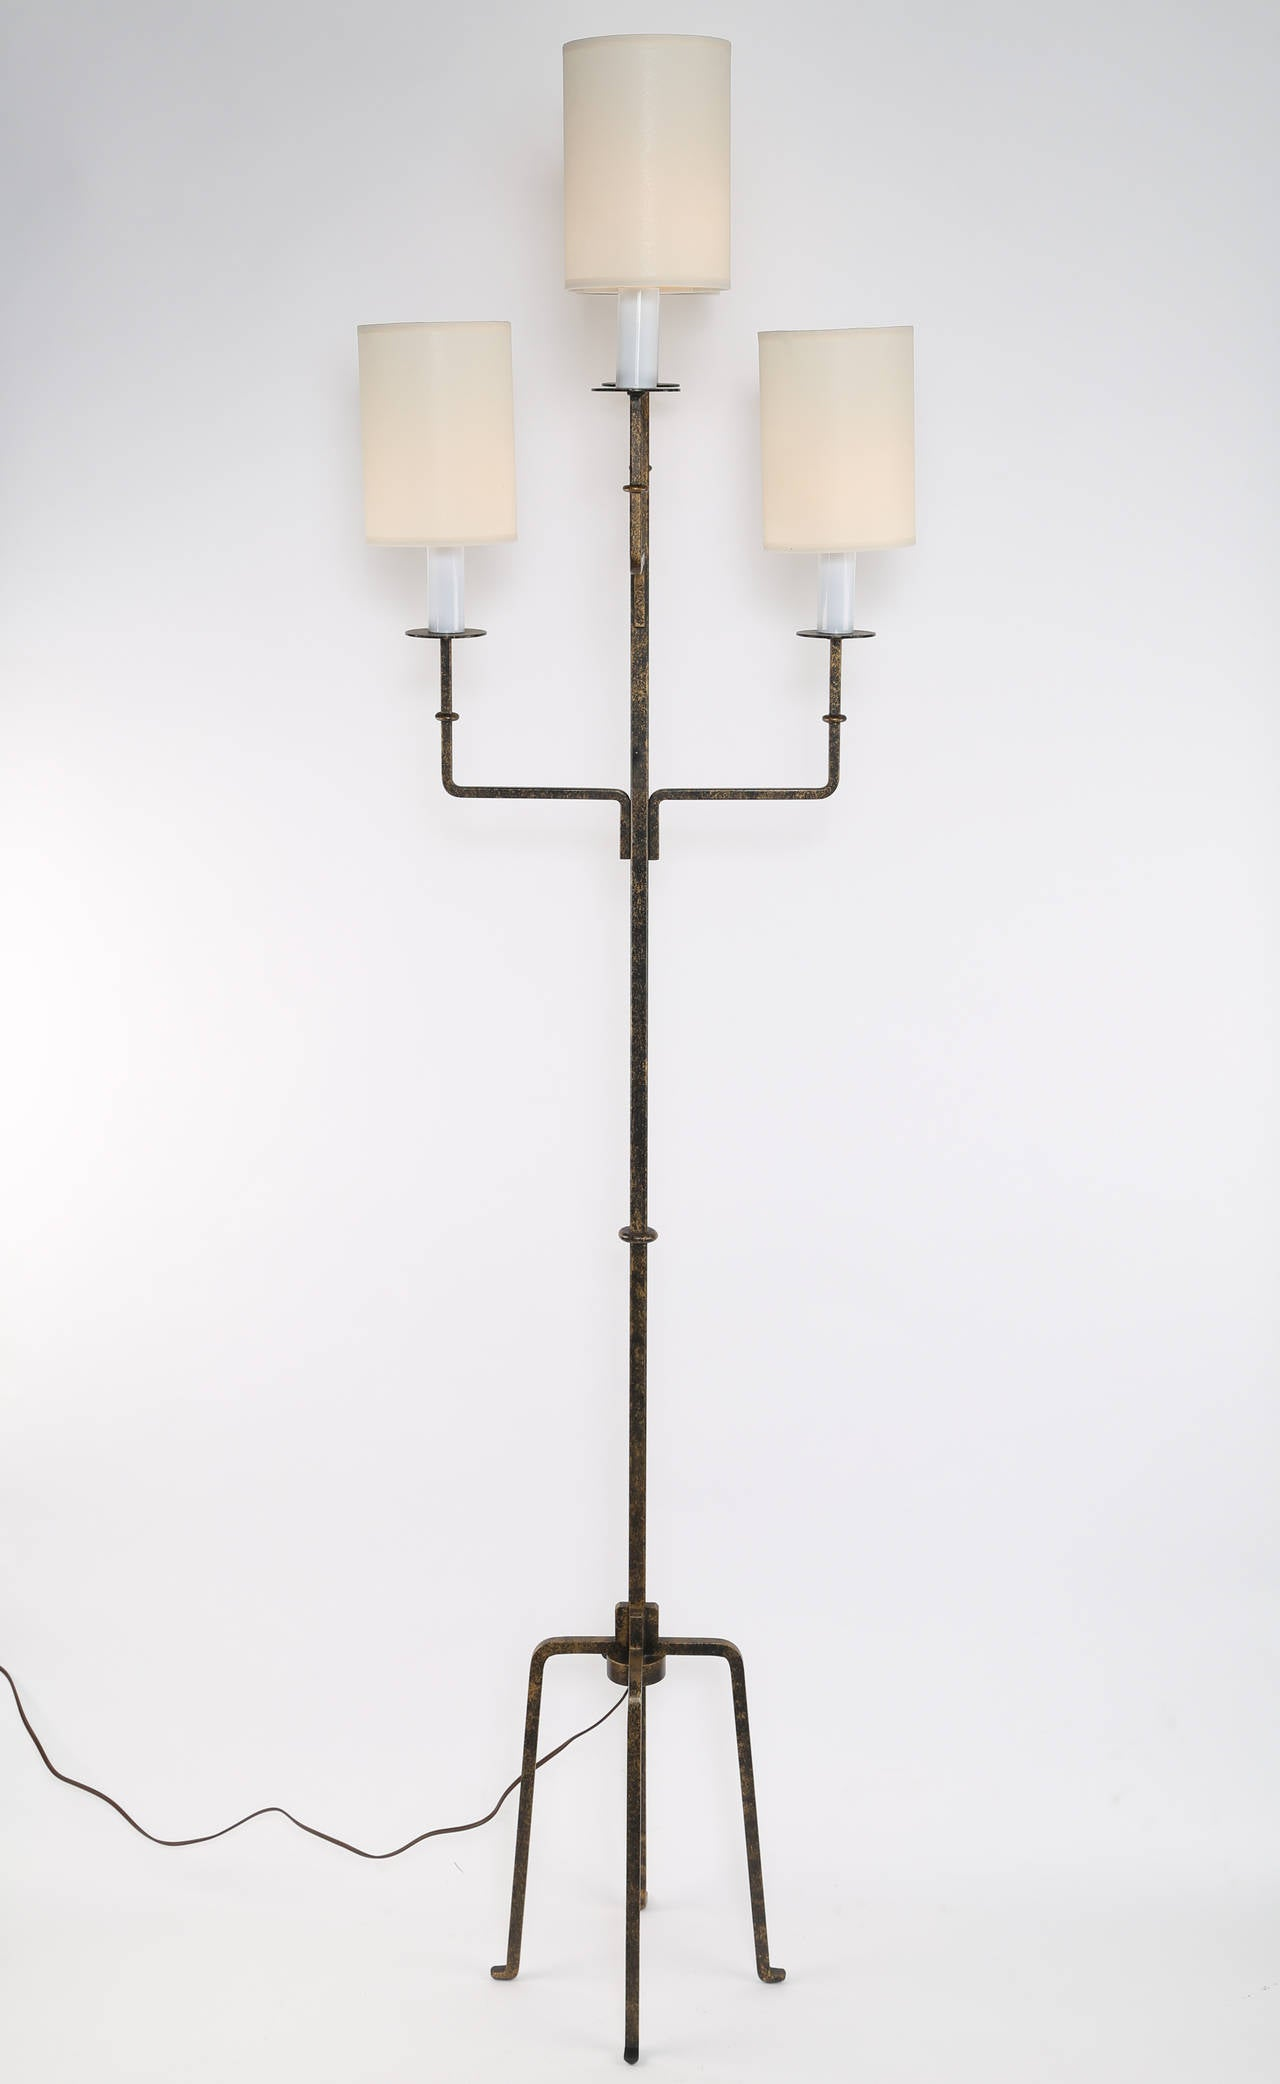 tommi parzinger wrought iron floor lamp at 1stdibs. Black Bedroom Furniture Sets. Home Design Ideas